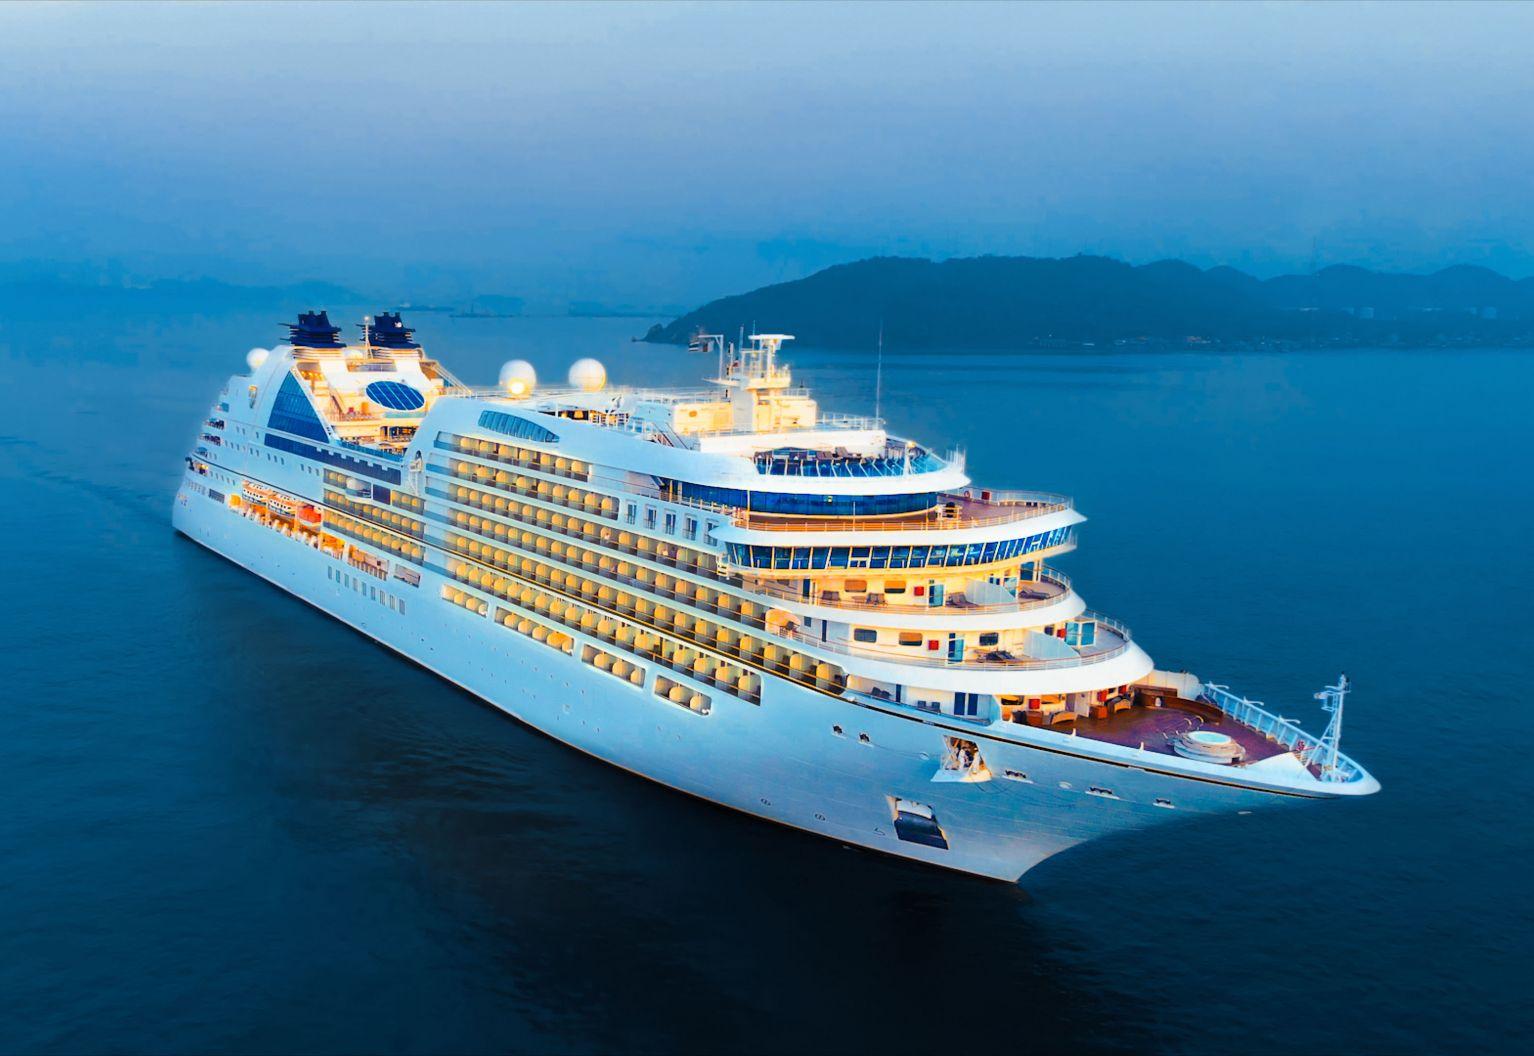 cruiseshipcrop-sanitation.jpg